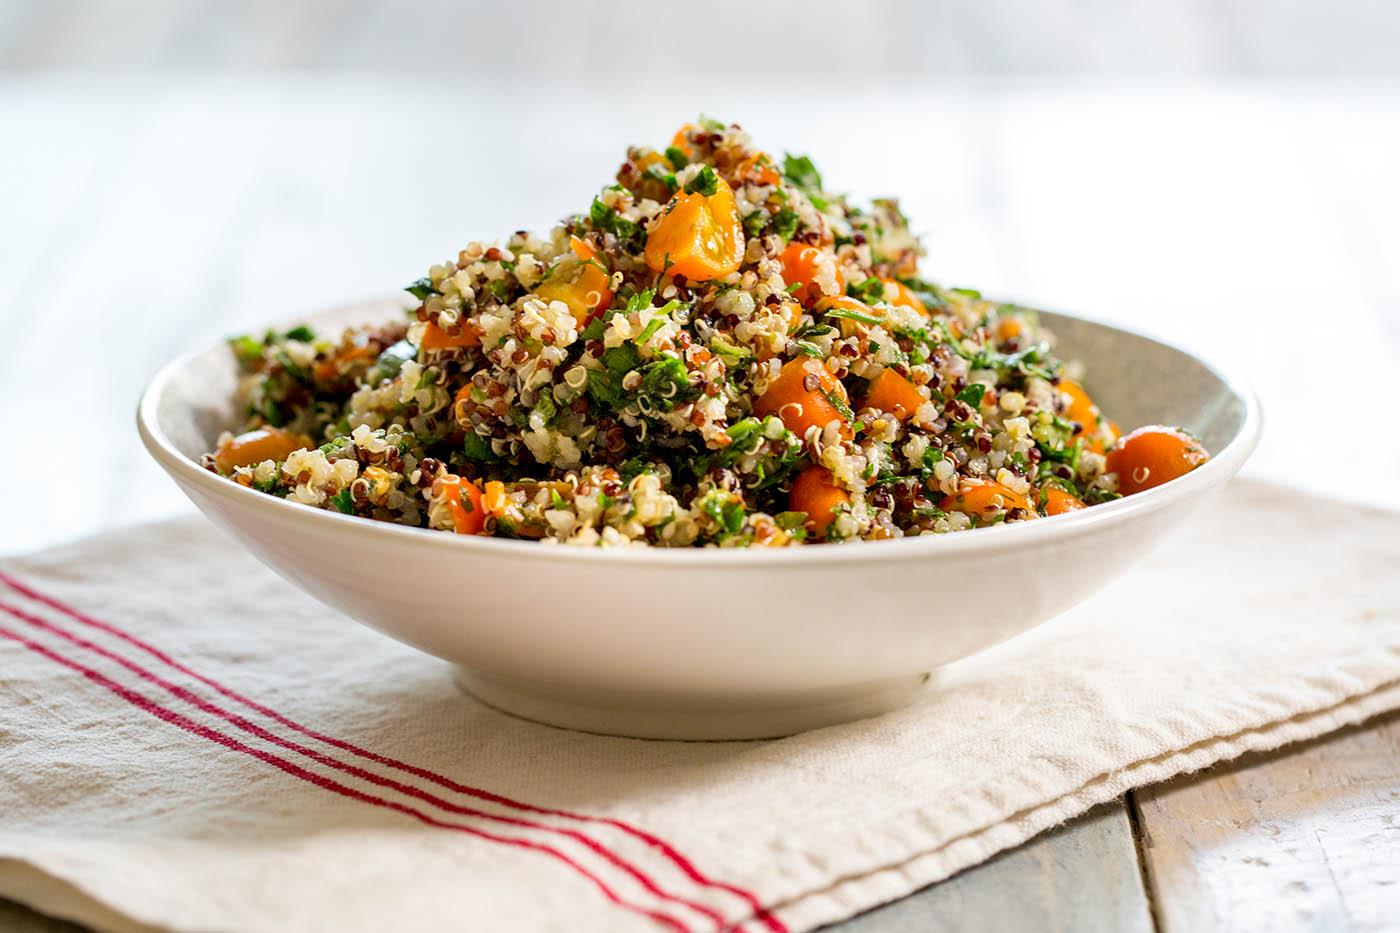 Gluten Free Quinoa Tabbouleh Salad